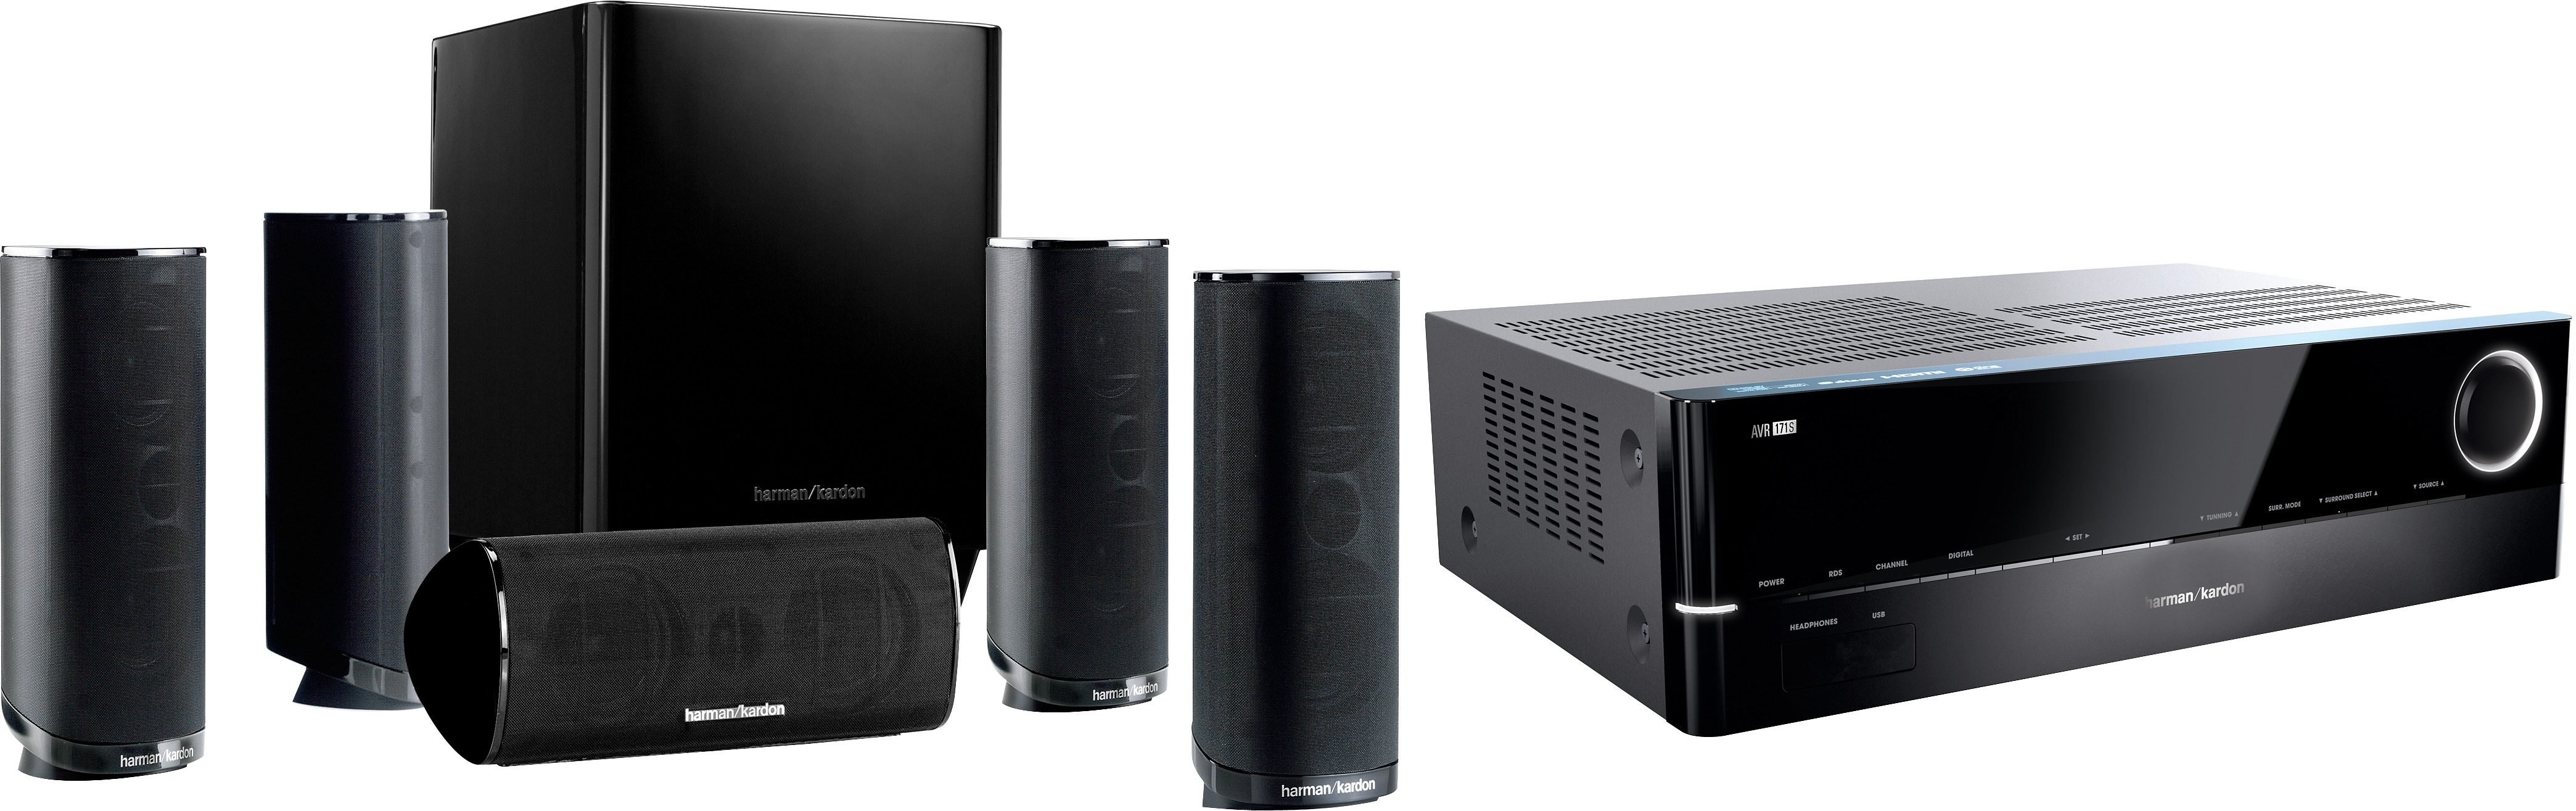 Harman/Kardon HD Com 1716S 5.1 Heimkinosystem (700 W, Bluetooth, Spotify)